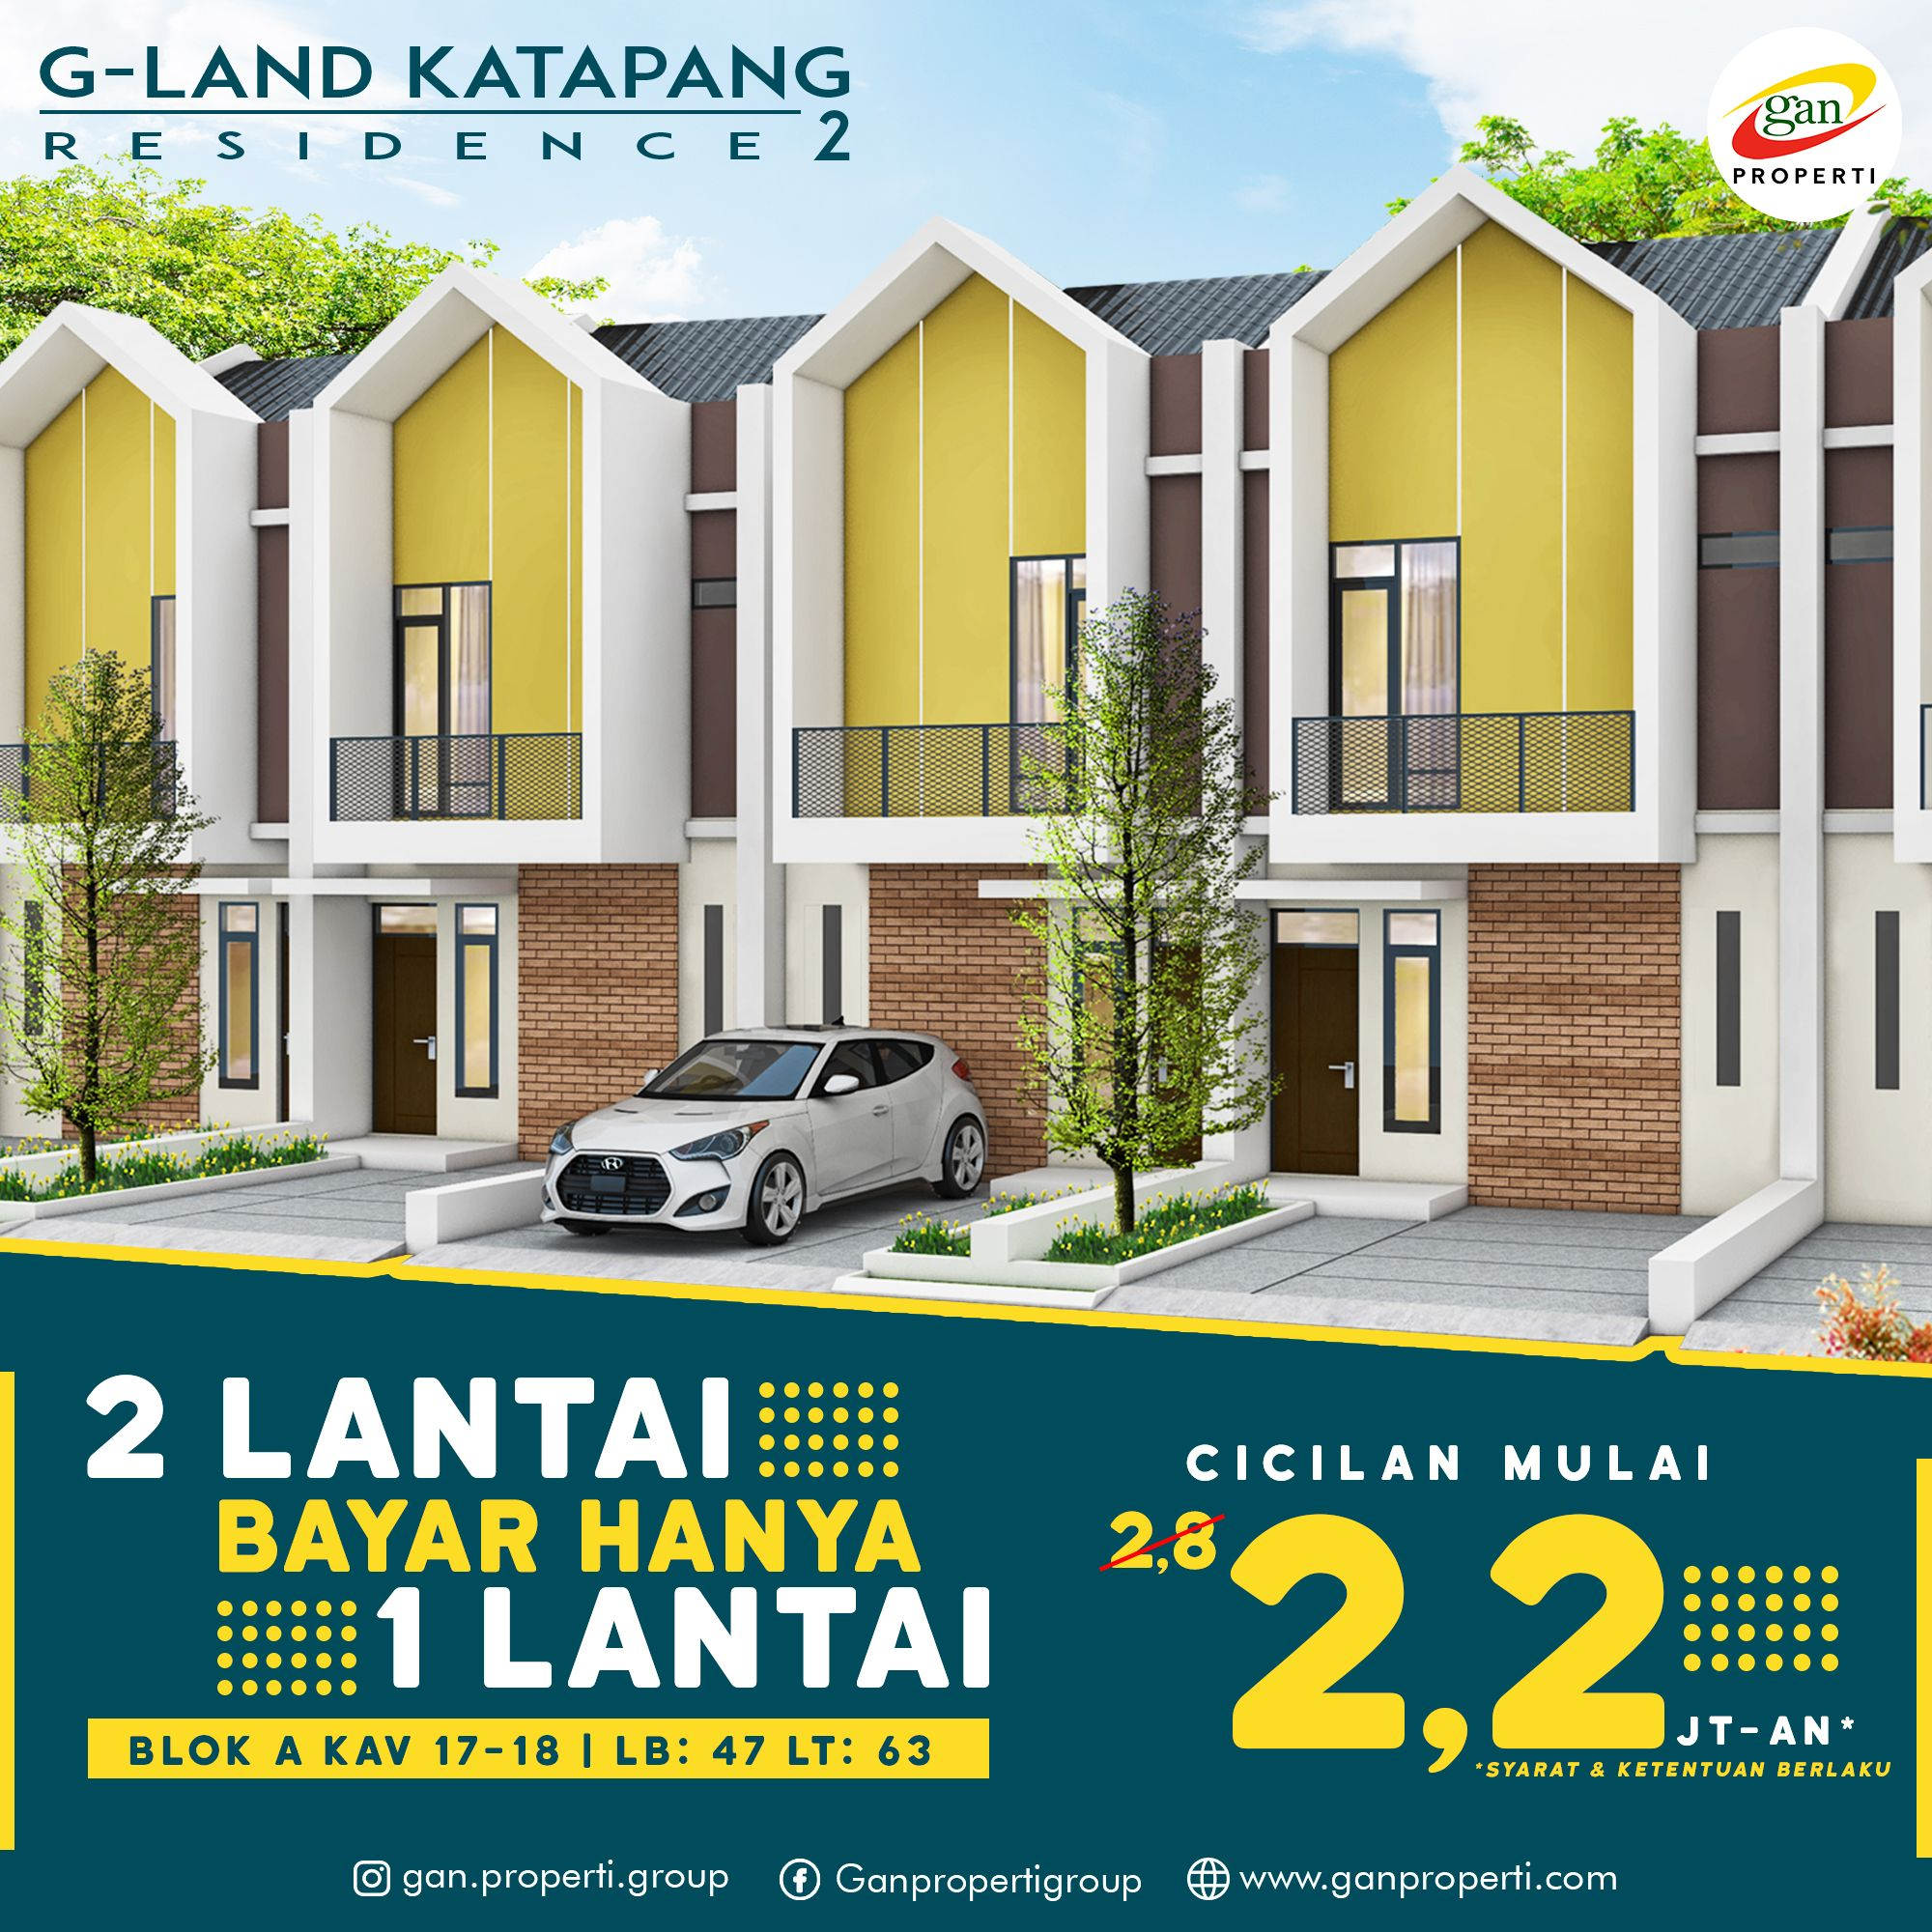 Jual Rumah Di Bandung 2 Lantai Soreang Katapang Kopo Pangauban Gandasoli Harga Murah Cicilan Ringan Rumah Impian Rumah Rumah Baru